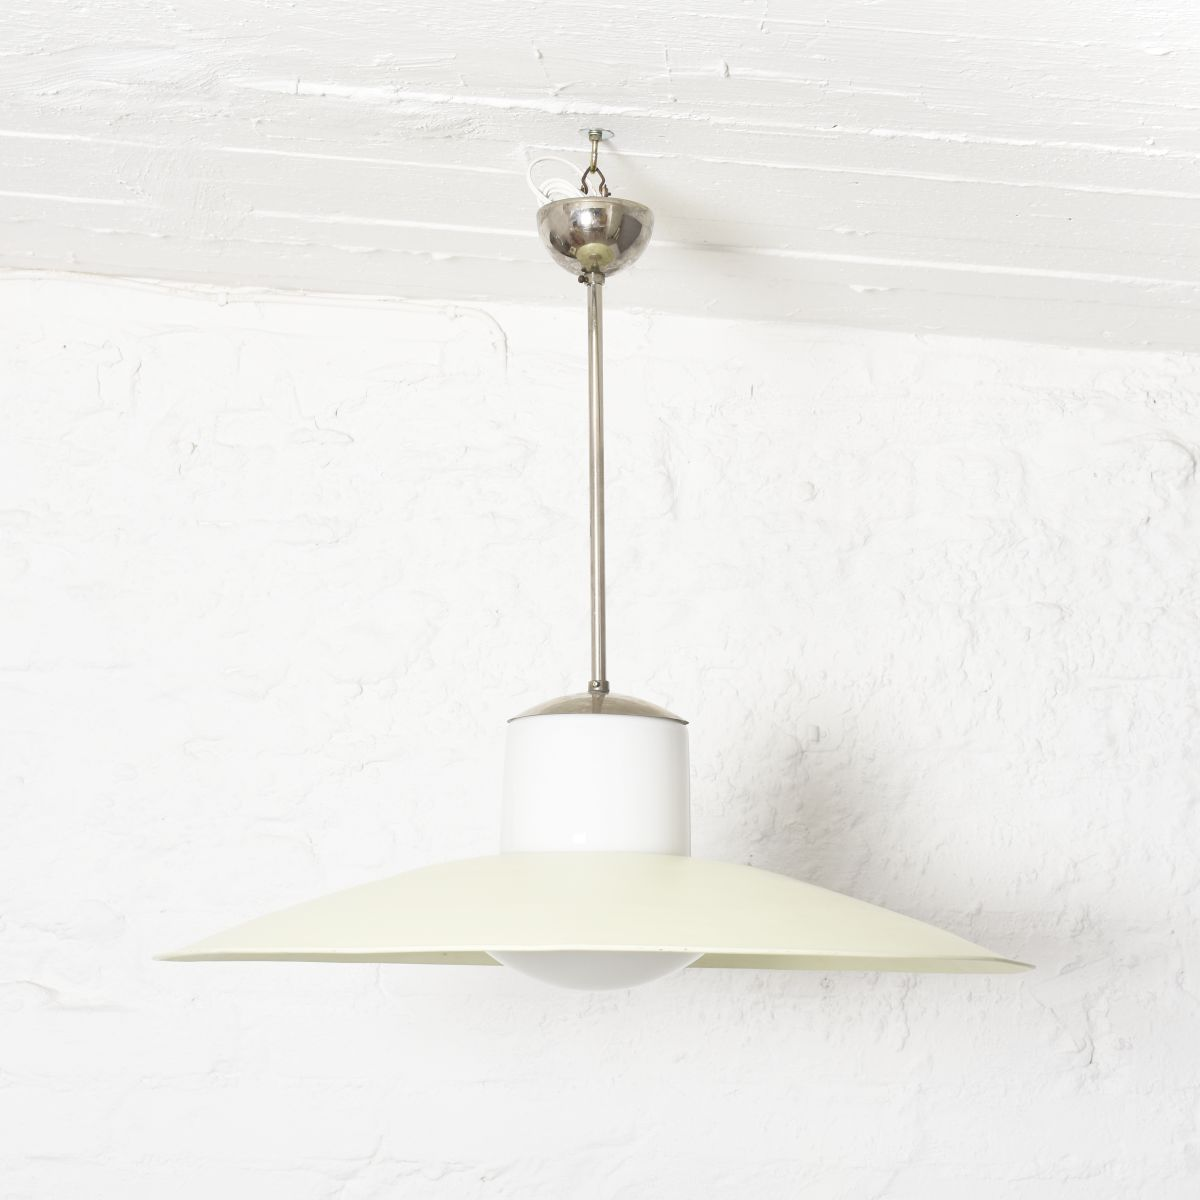 Tynell-Paavo-Seling-Lamp-Aalto-home-Idman